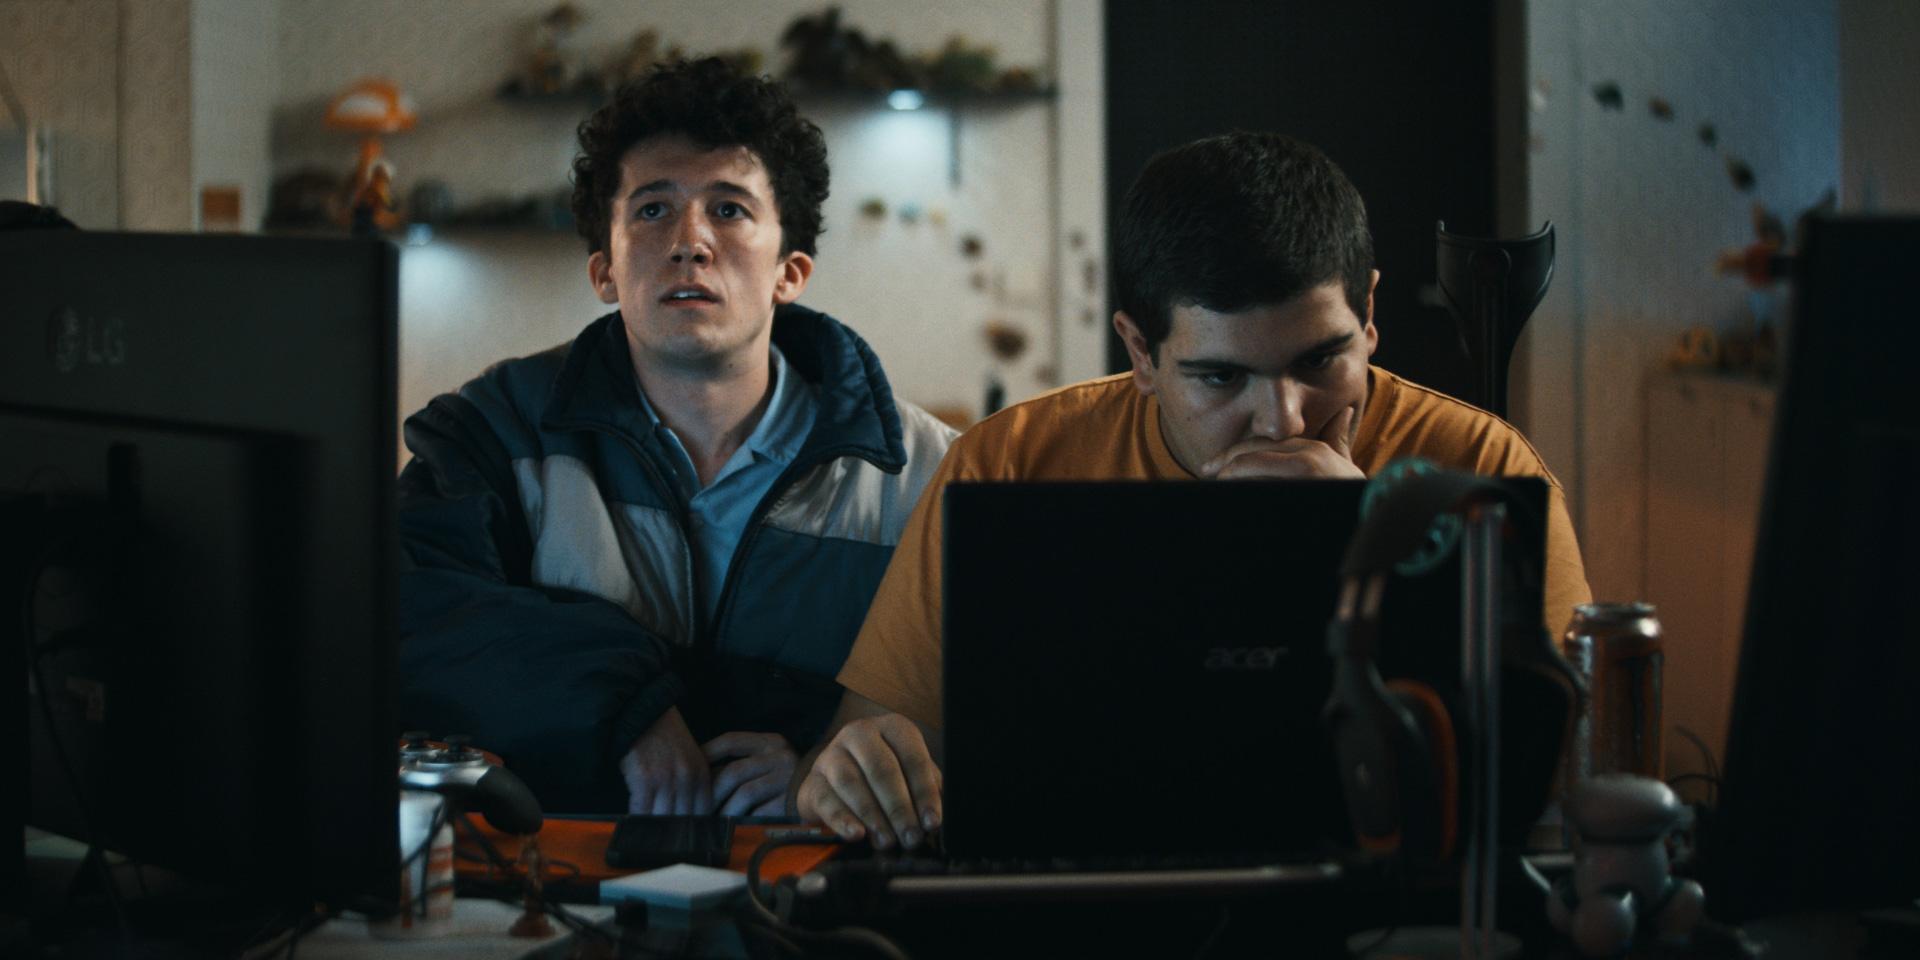 Maximilian Mundt and Danilo Kamperidis in Nerd Today, Boss Tomorrow (2019)